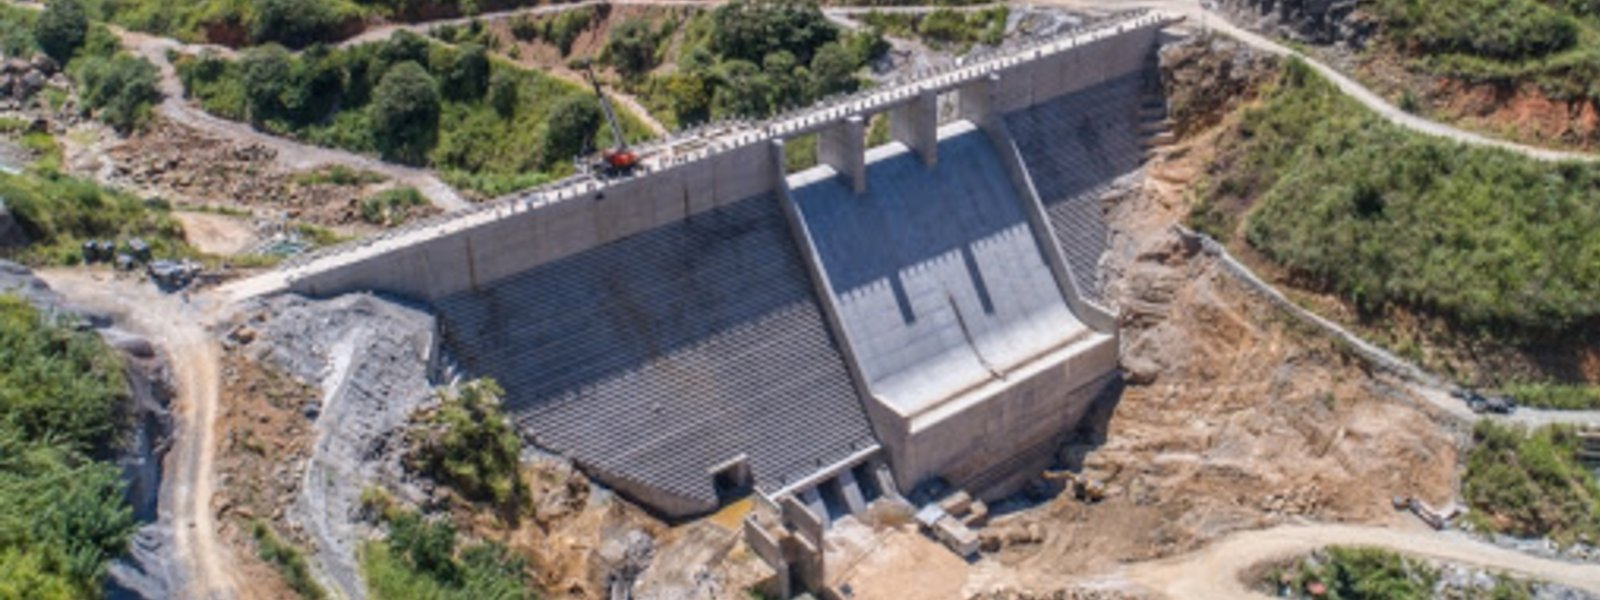 85 Iranian Technicians in Sri Lanka to complete Uma-Oya Project